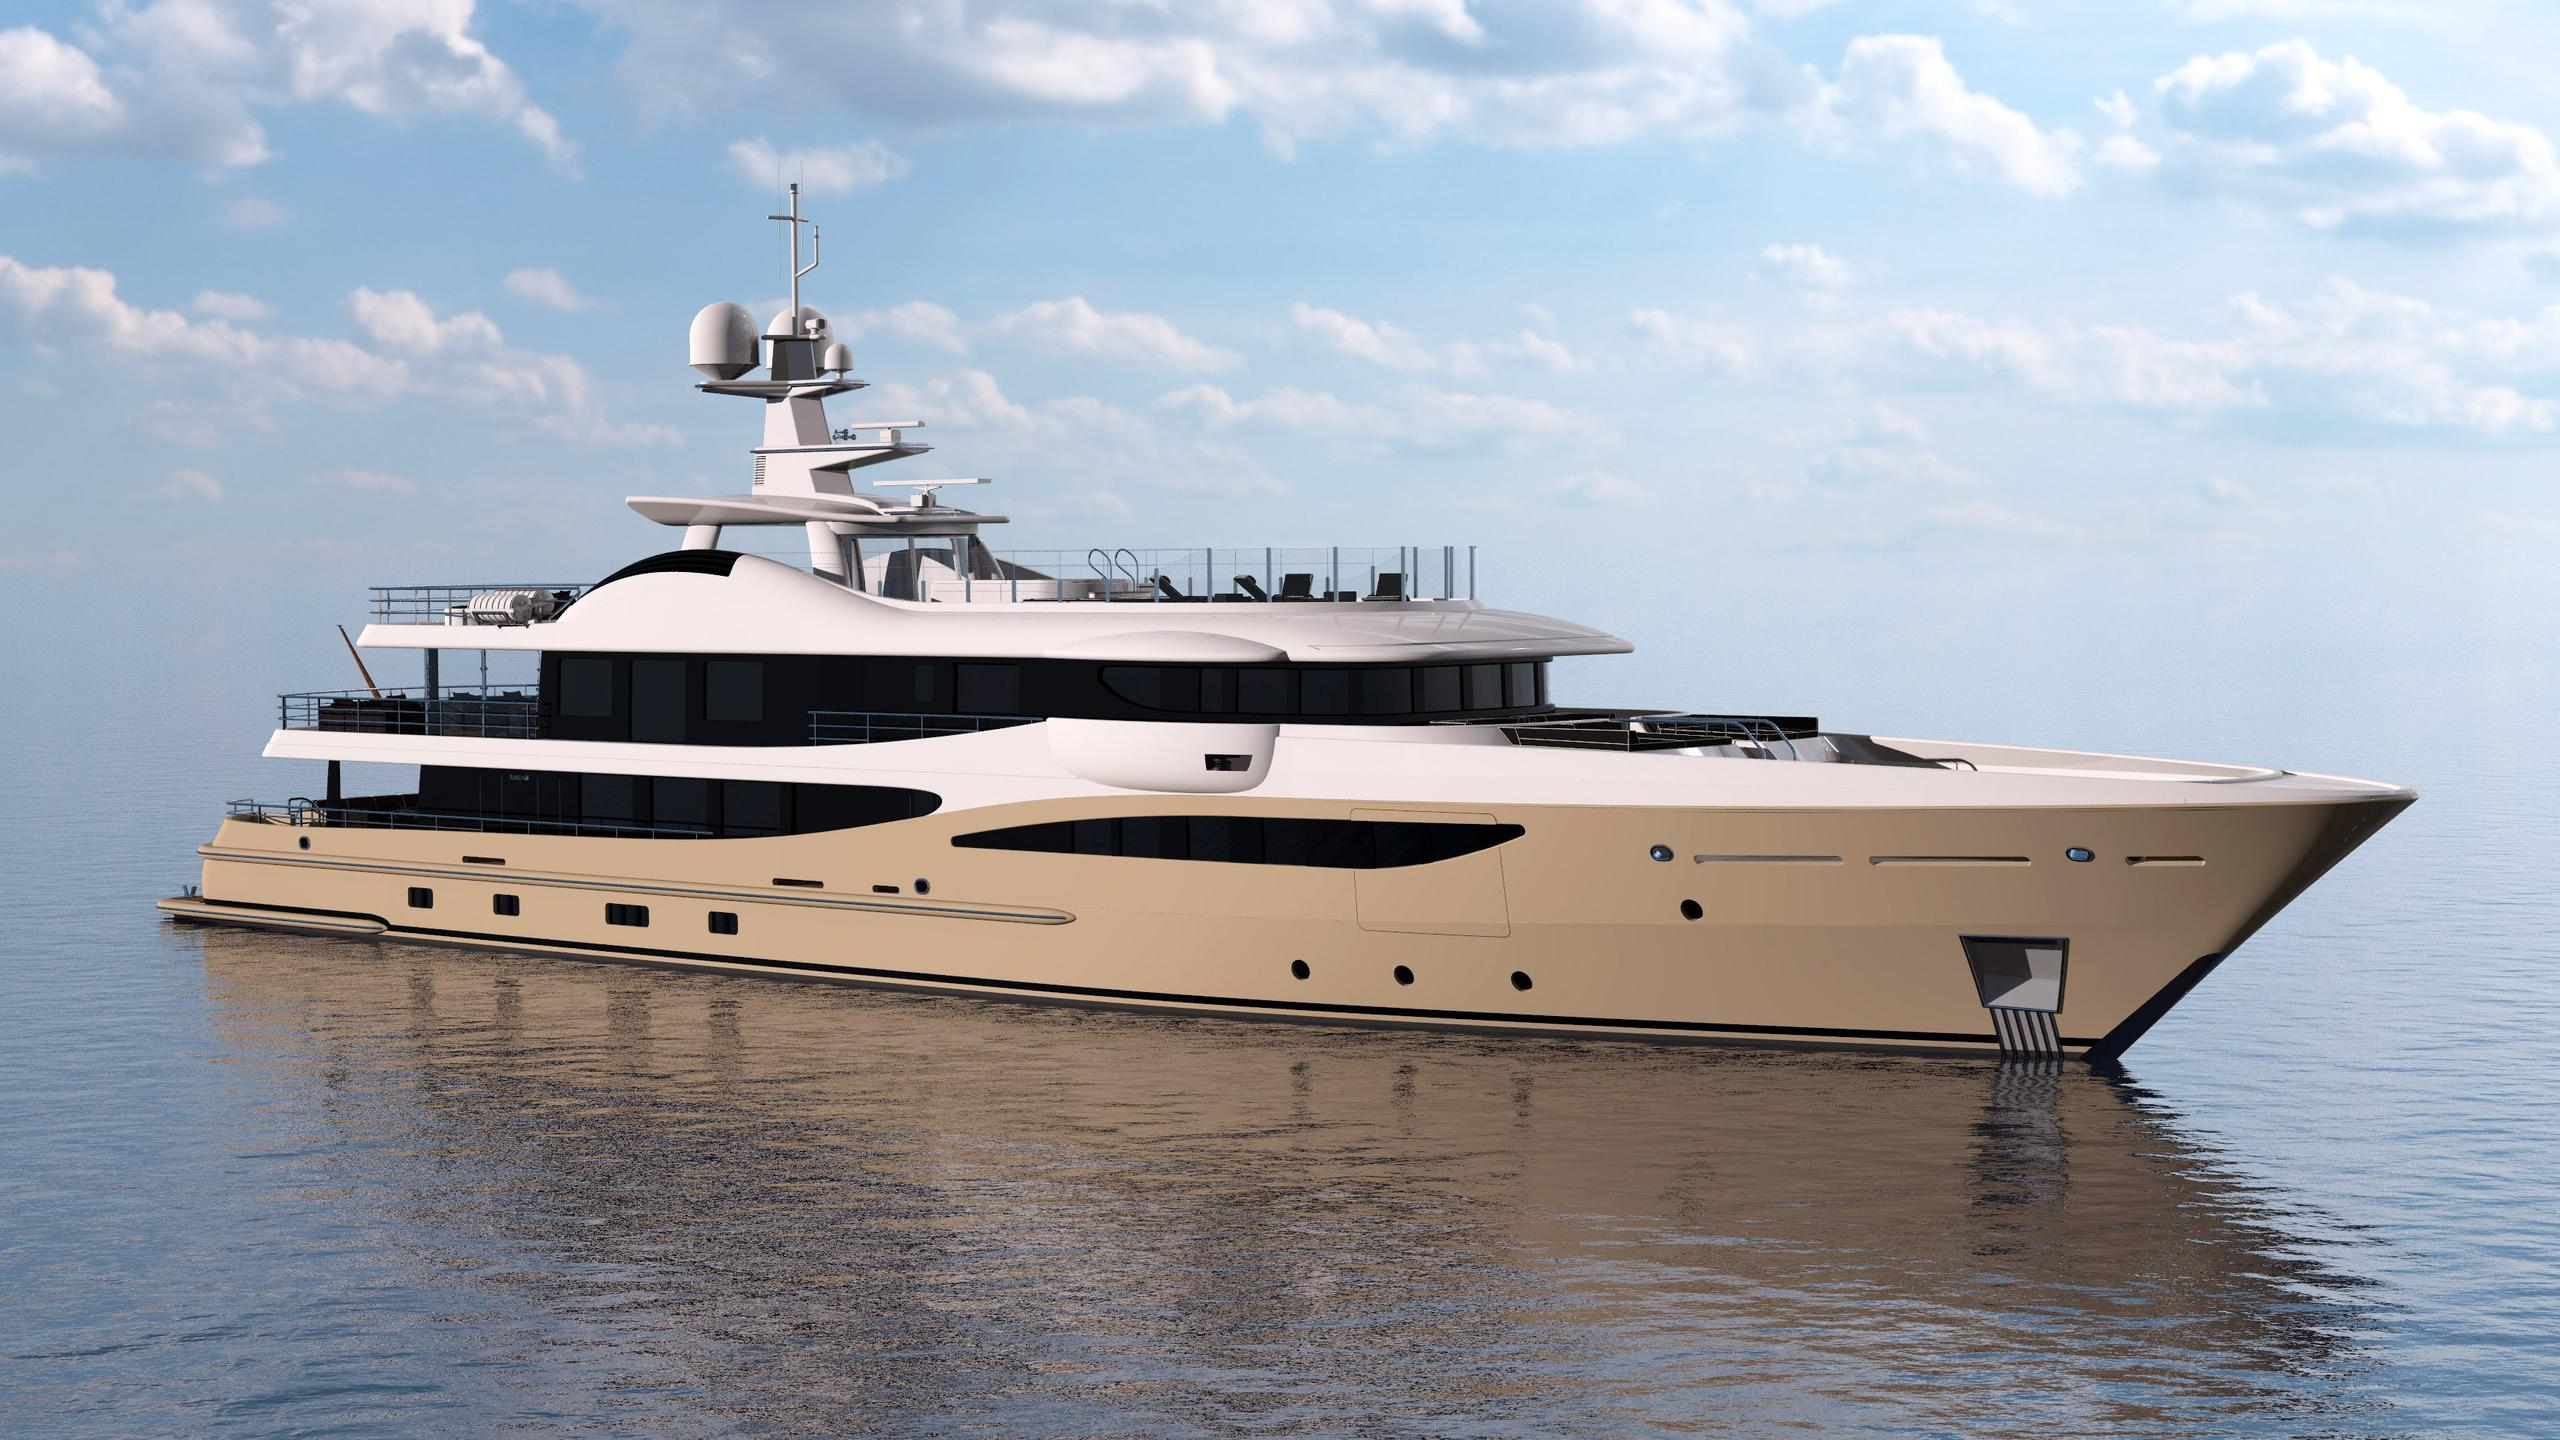 lili motoryacht amels le180 55m 2017 half profile rendering